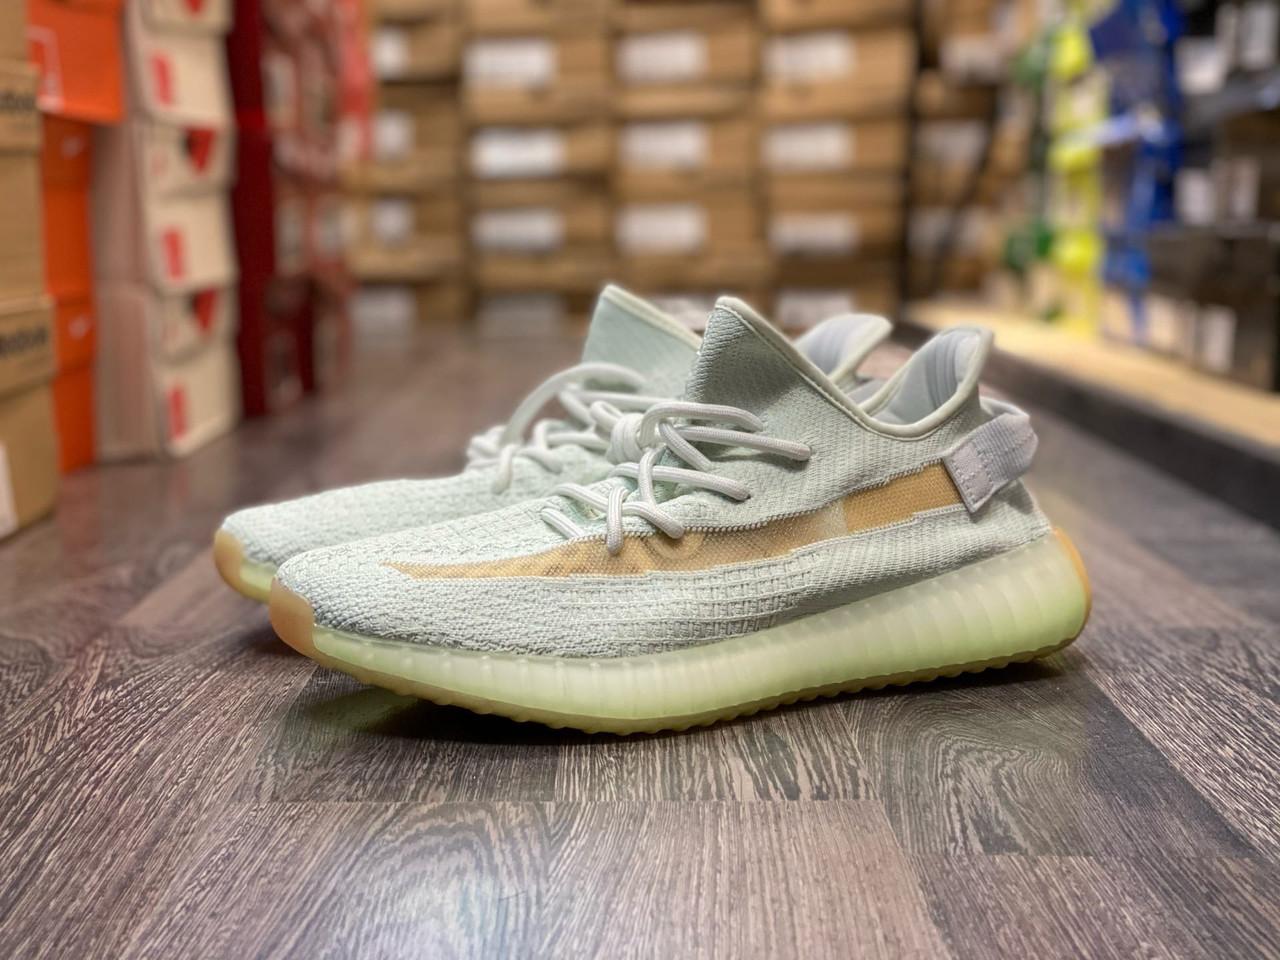 Кроссовки Adidas Yeezy Boost 350 V2 Hypers - фото 1